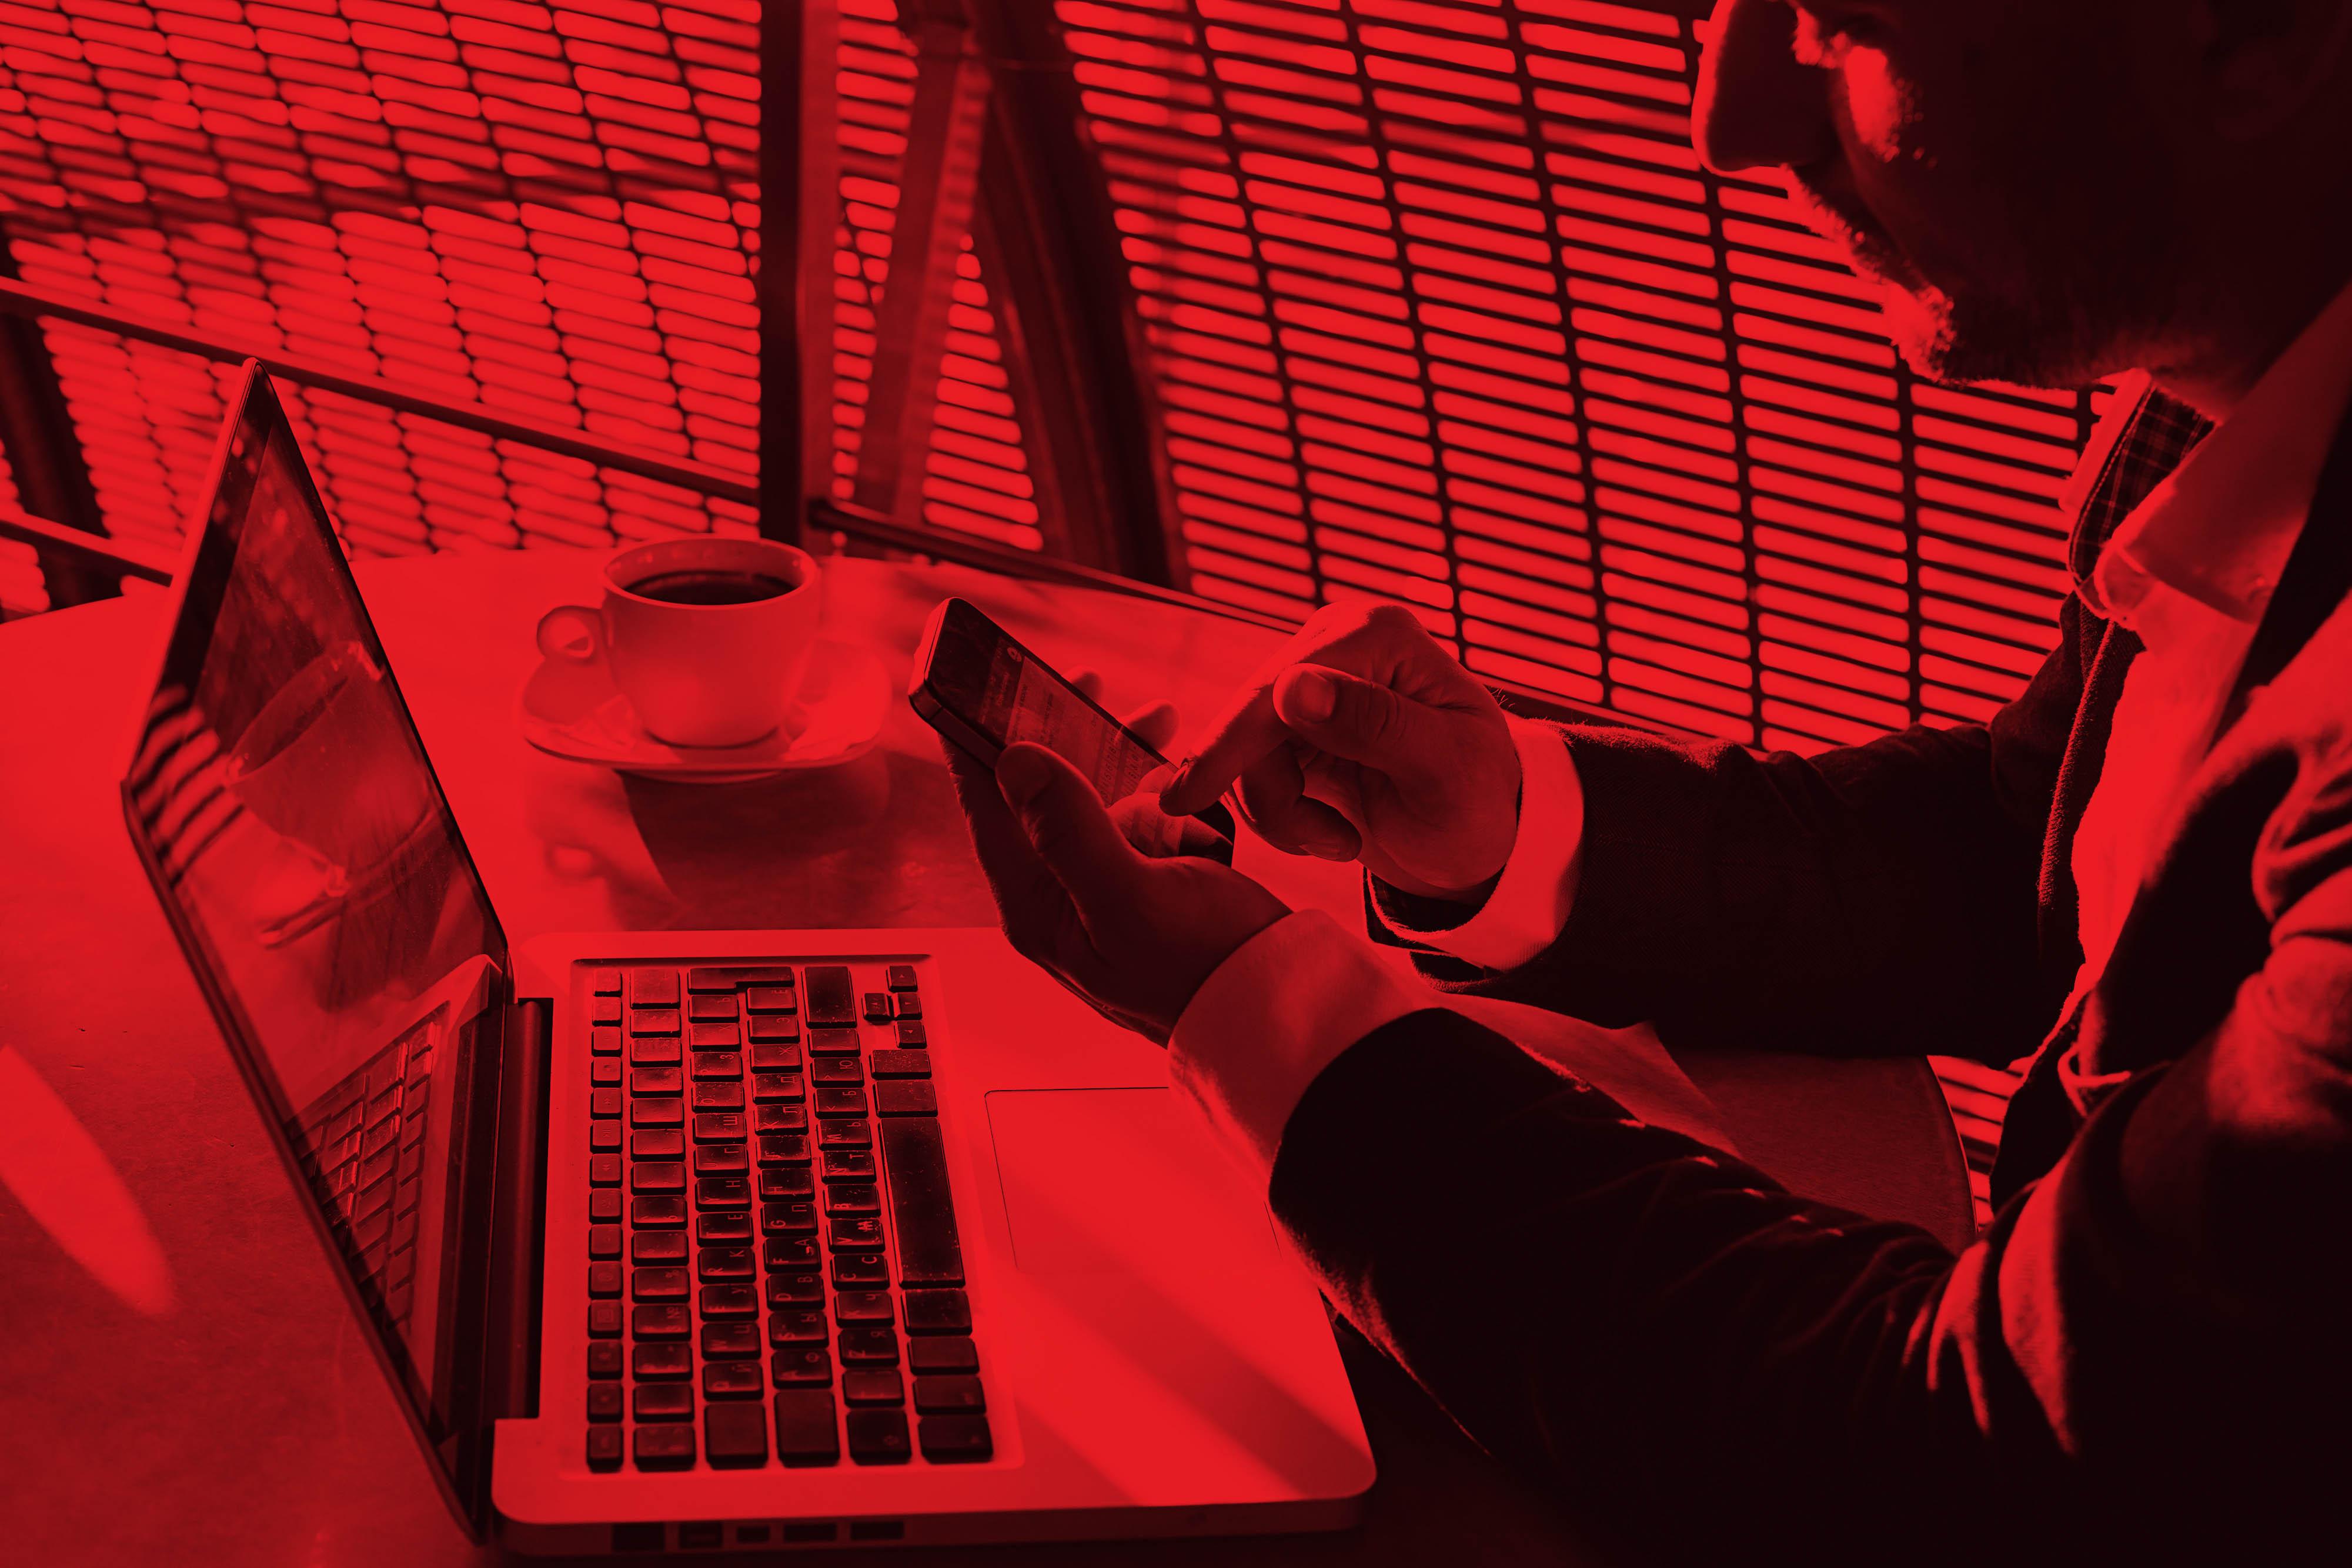 Man_Coffee_Laptop_Cell_Red.jpg